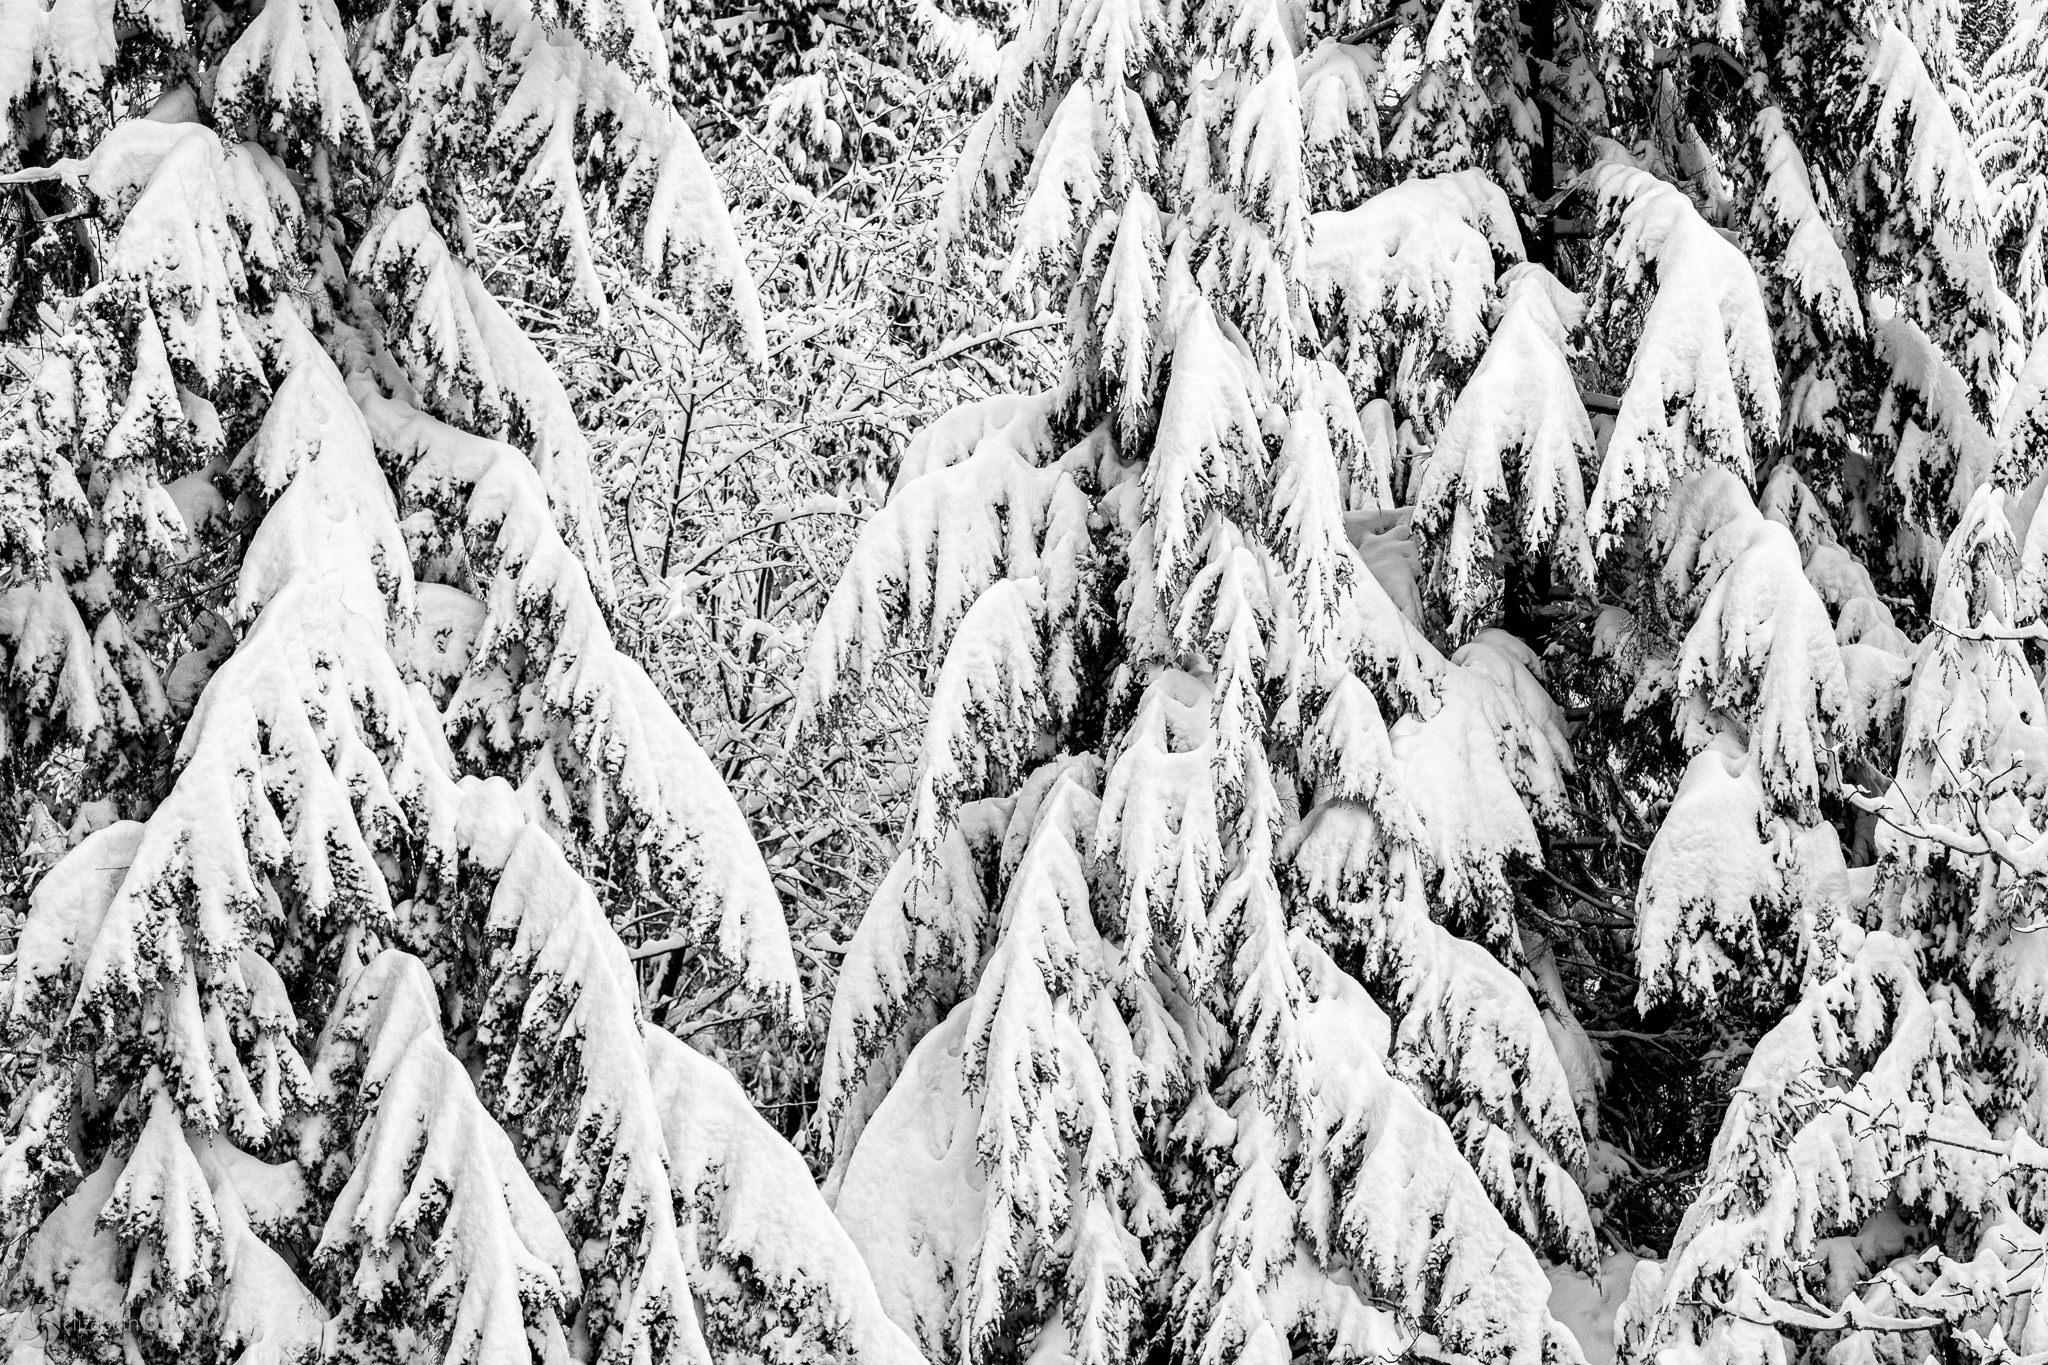 Snowy Textures